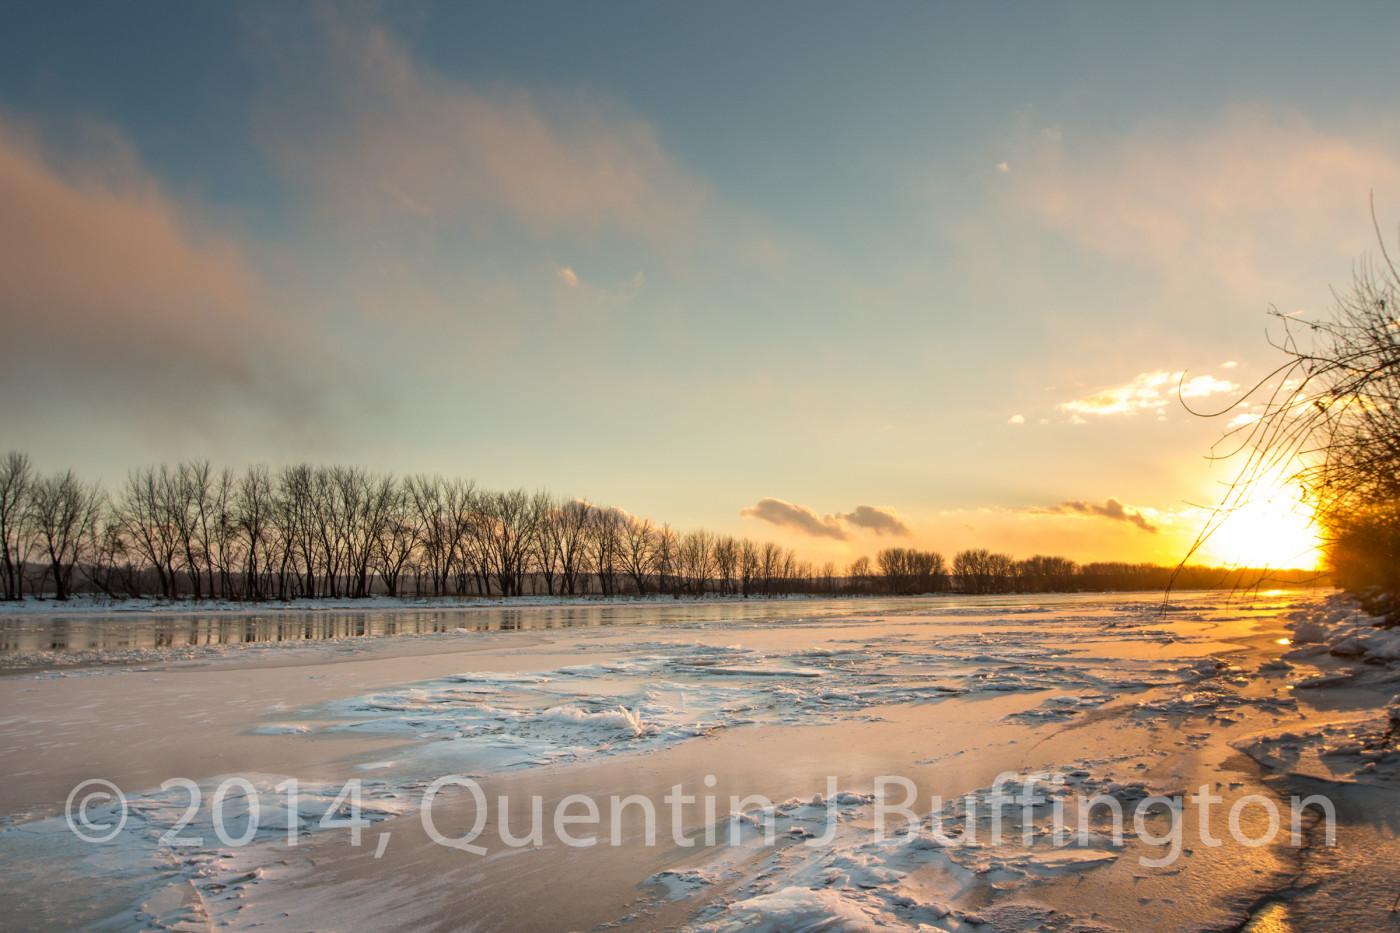 Quentin-365-1